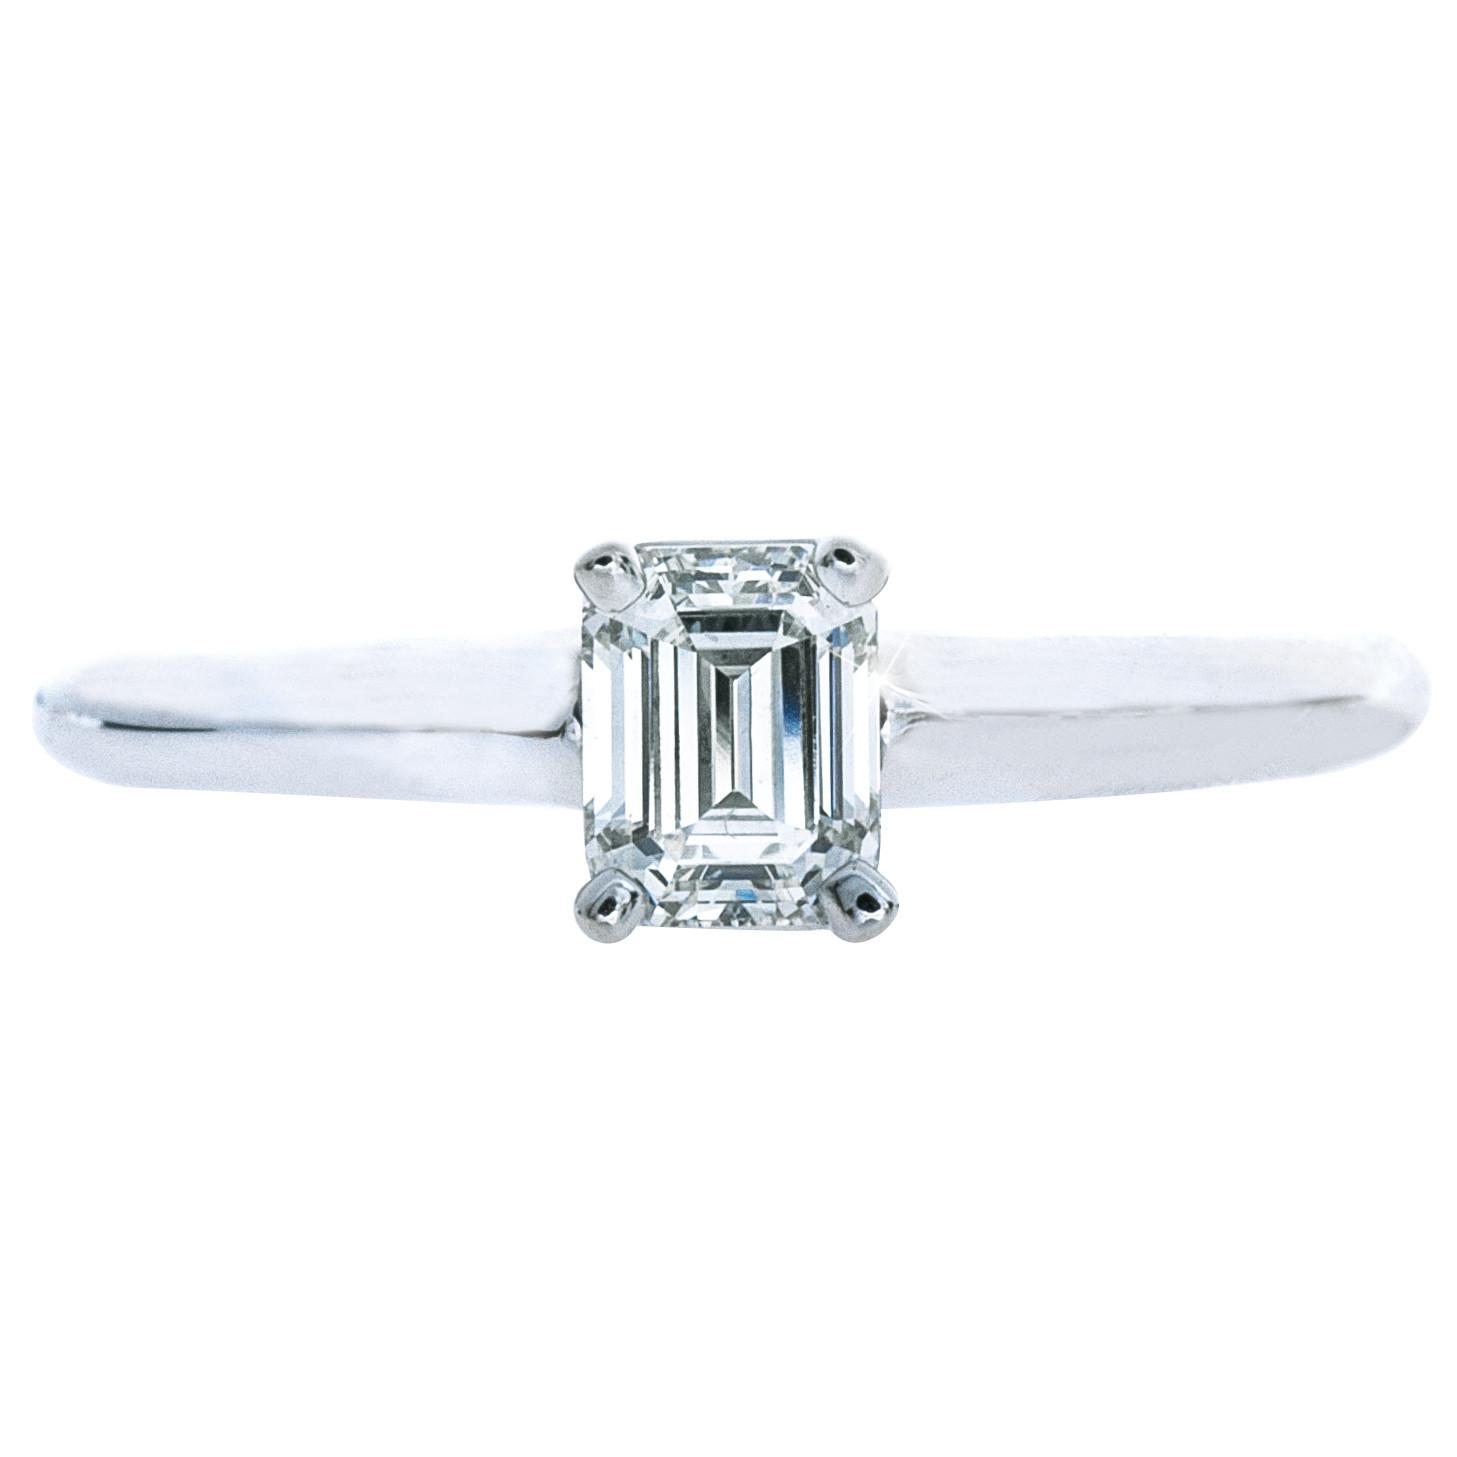 Vintage 0.50 CT Diamond Engagment Ring